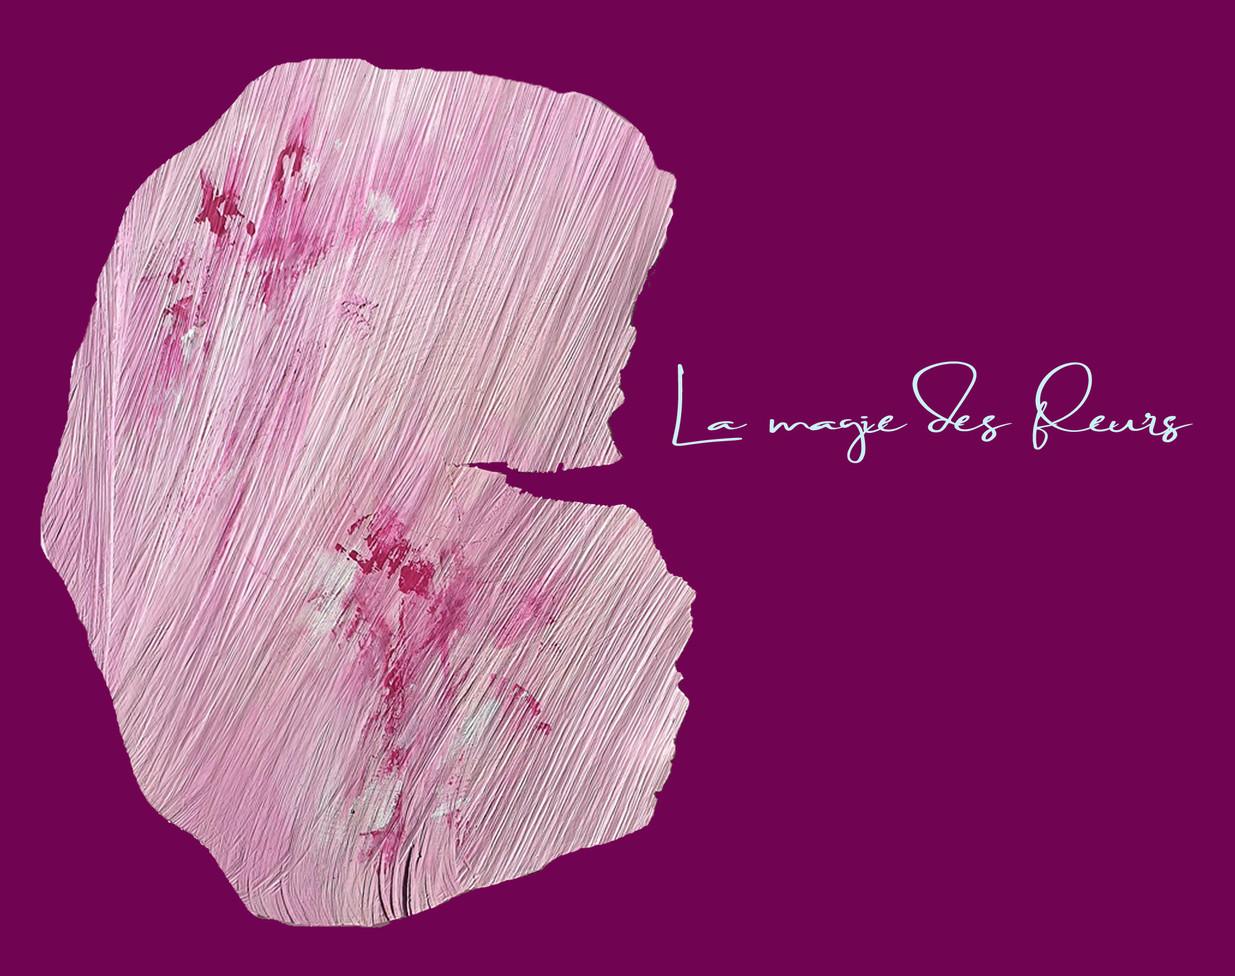 fotobuch baumscheibe rosa 3.jpg